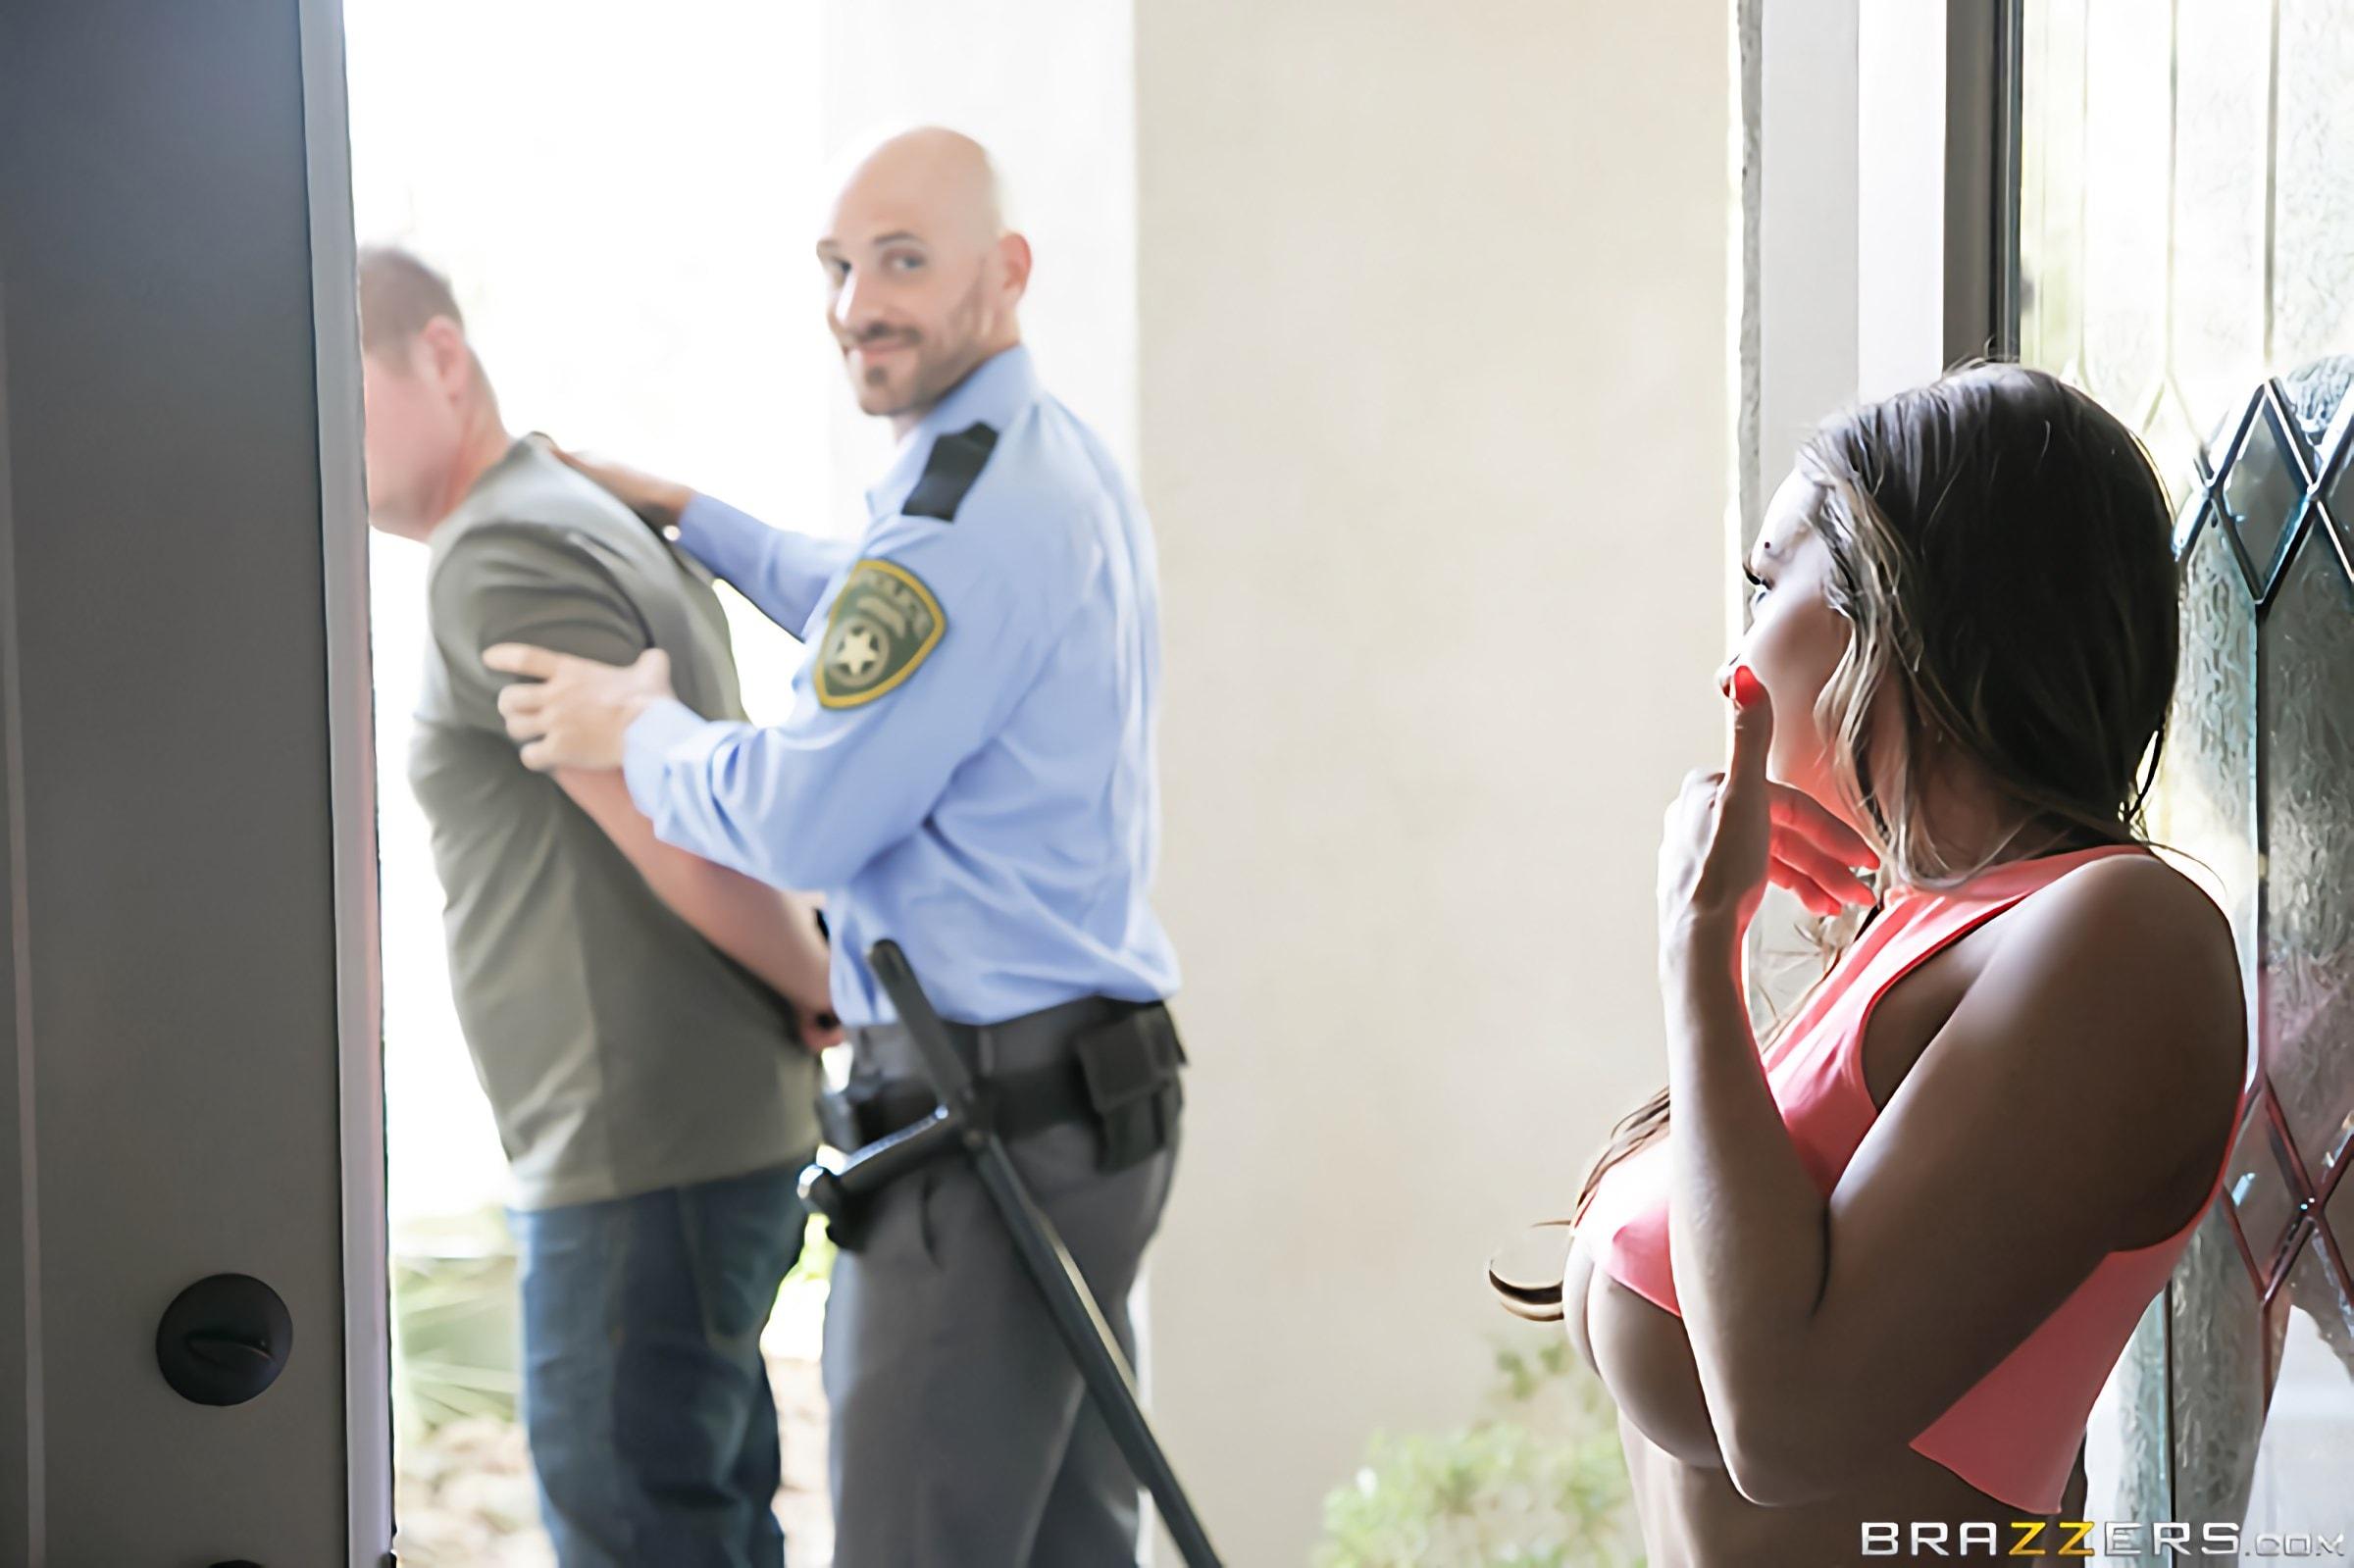 Brazzers 'A Domestic Dicking' starring Abigail Mac (Photo 15)